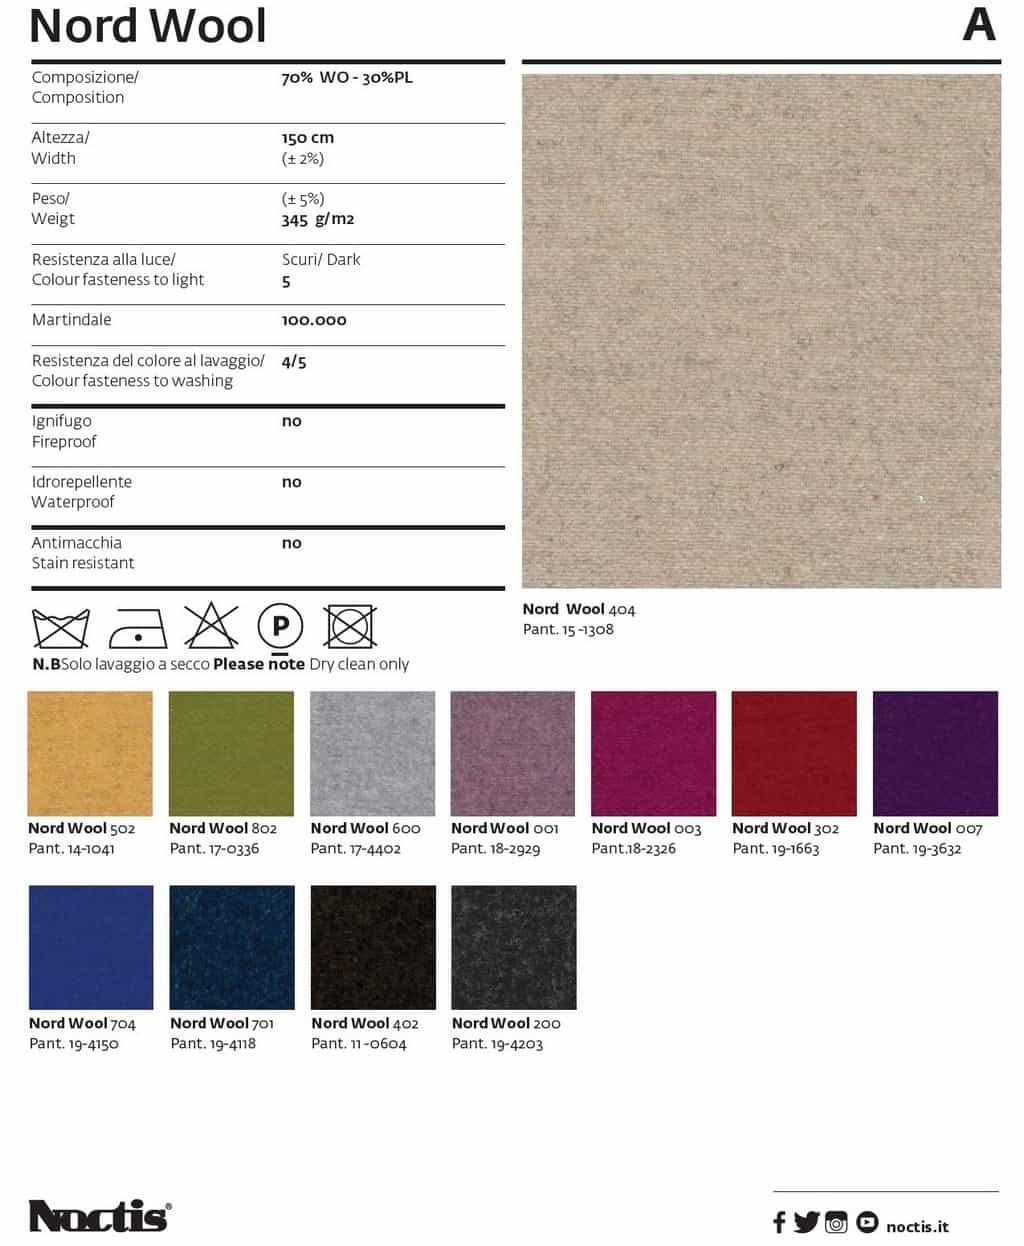 norld wool fabrics cat a noctis